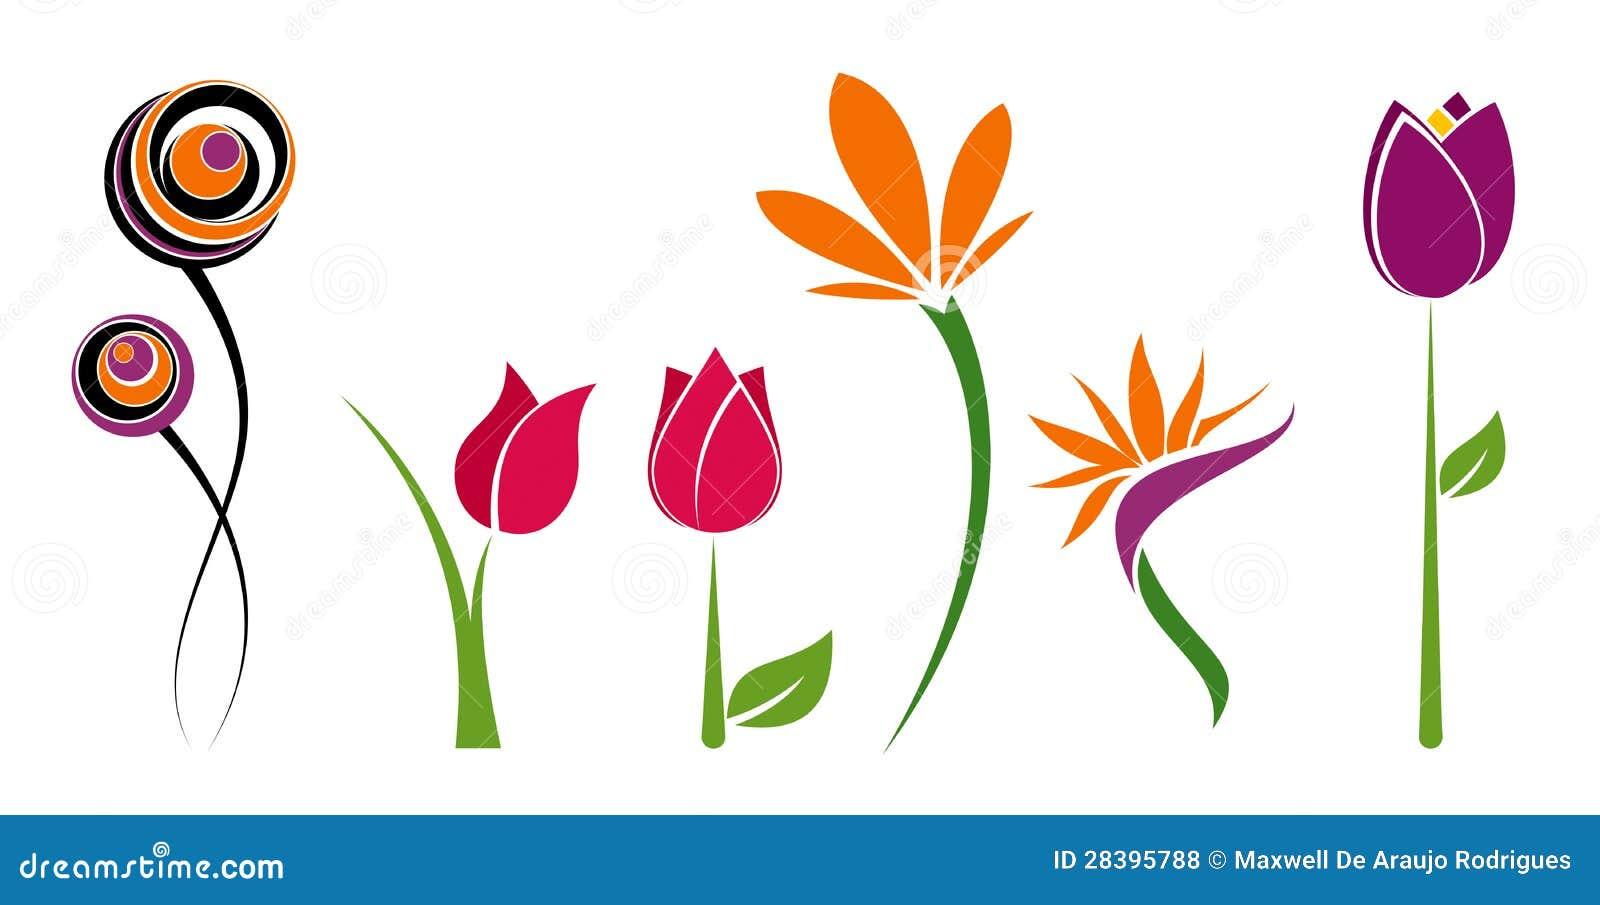 Seis flores